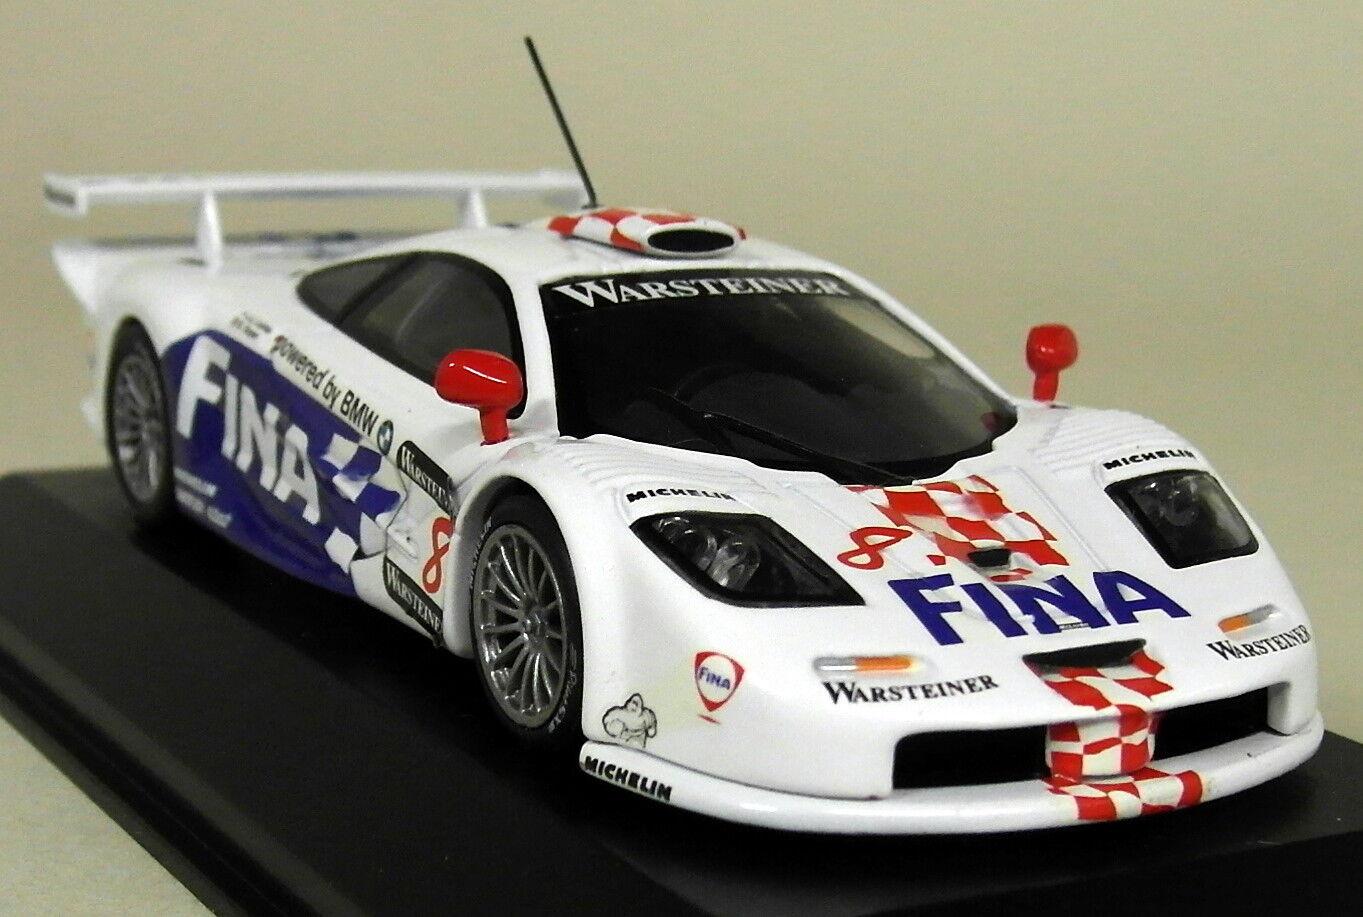 Minichamps 1/43 SCALA Dealer McLaren f1 GTR  8 FIA GT Champ 97 Modello Diecast Auto